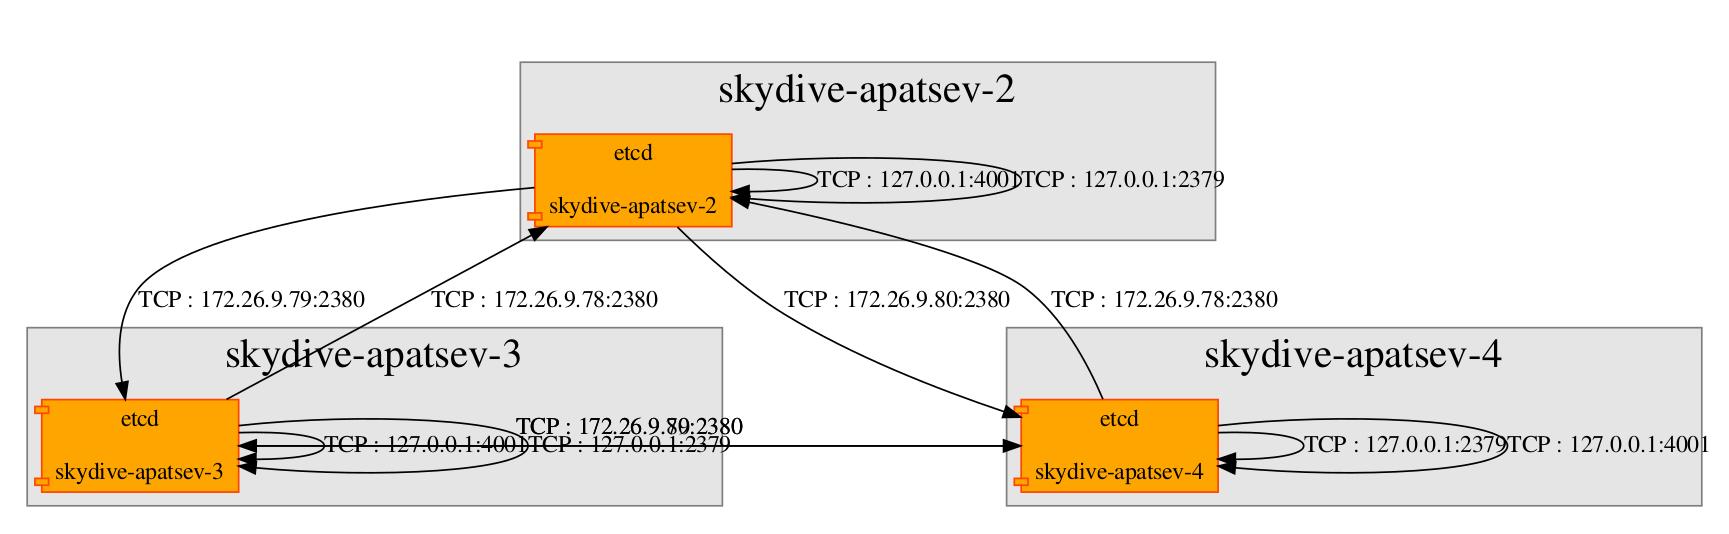 Введение в skydive.network - 3